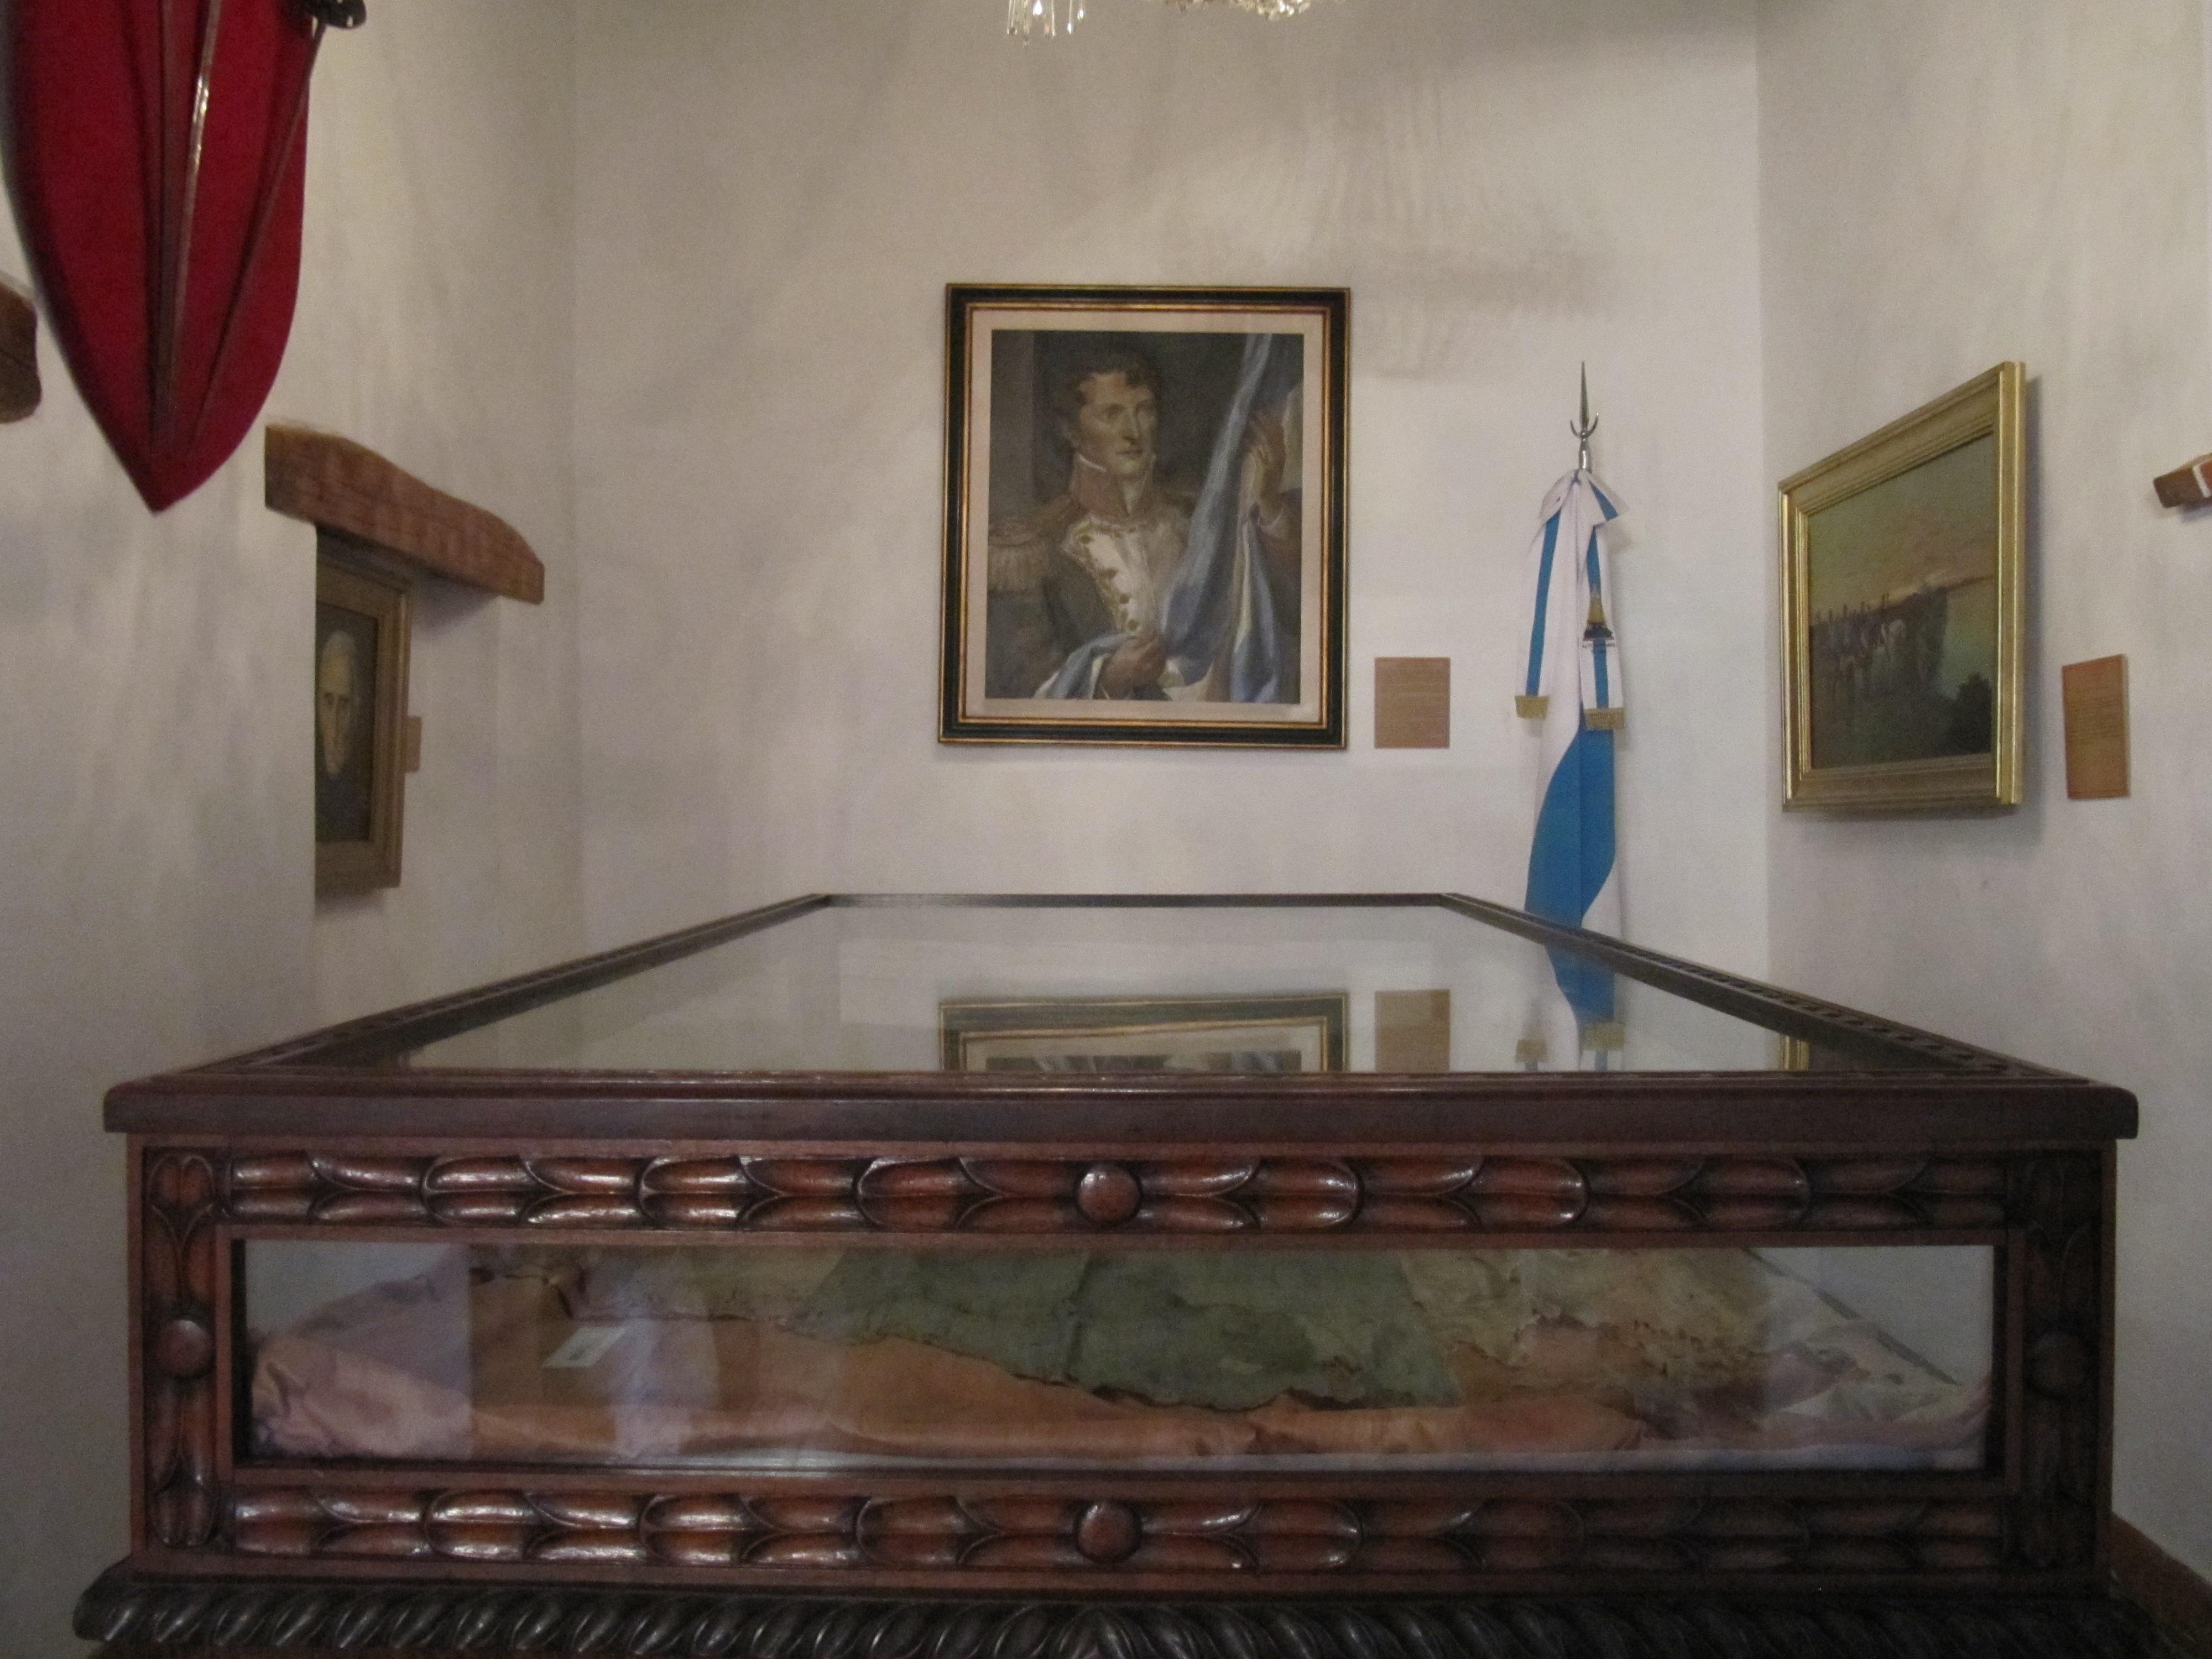 http://upload.wikimedia.org/wikipedia/commons/d/d7/Bandera_de_Macha_Argentina.JPG